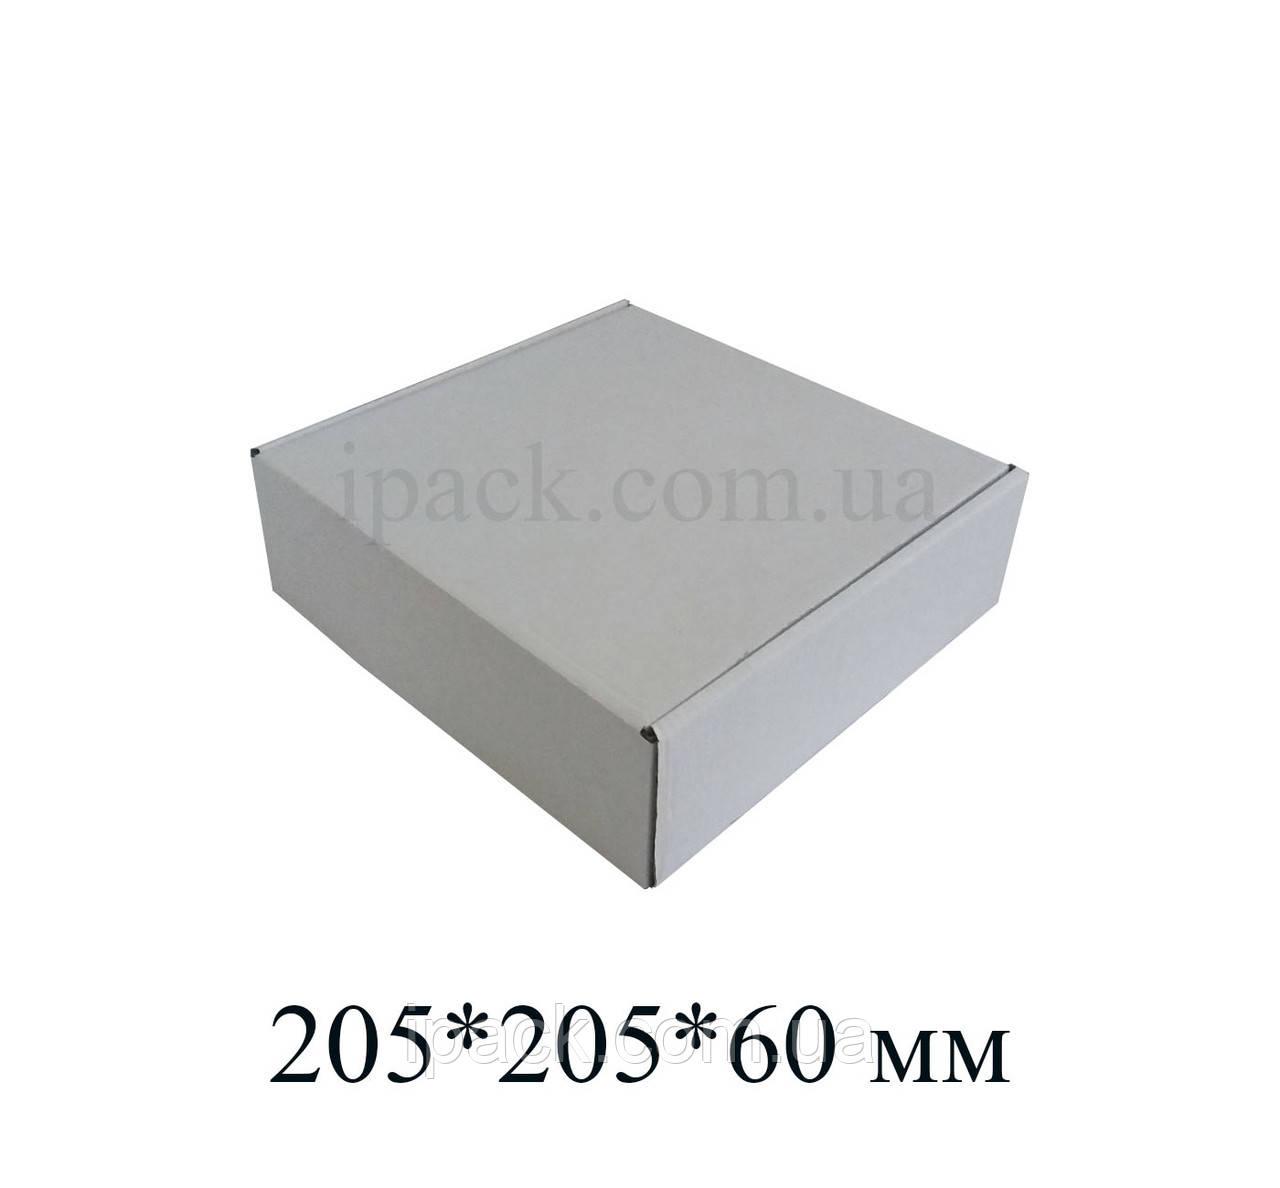 Коробка картонная самосборная, 205*205*60, мм, белая, микрогофрокартон